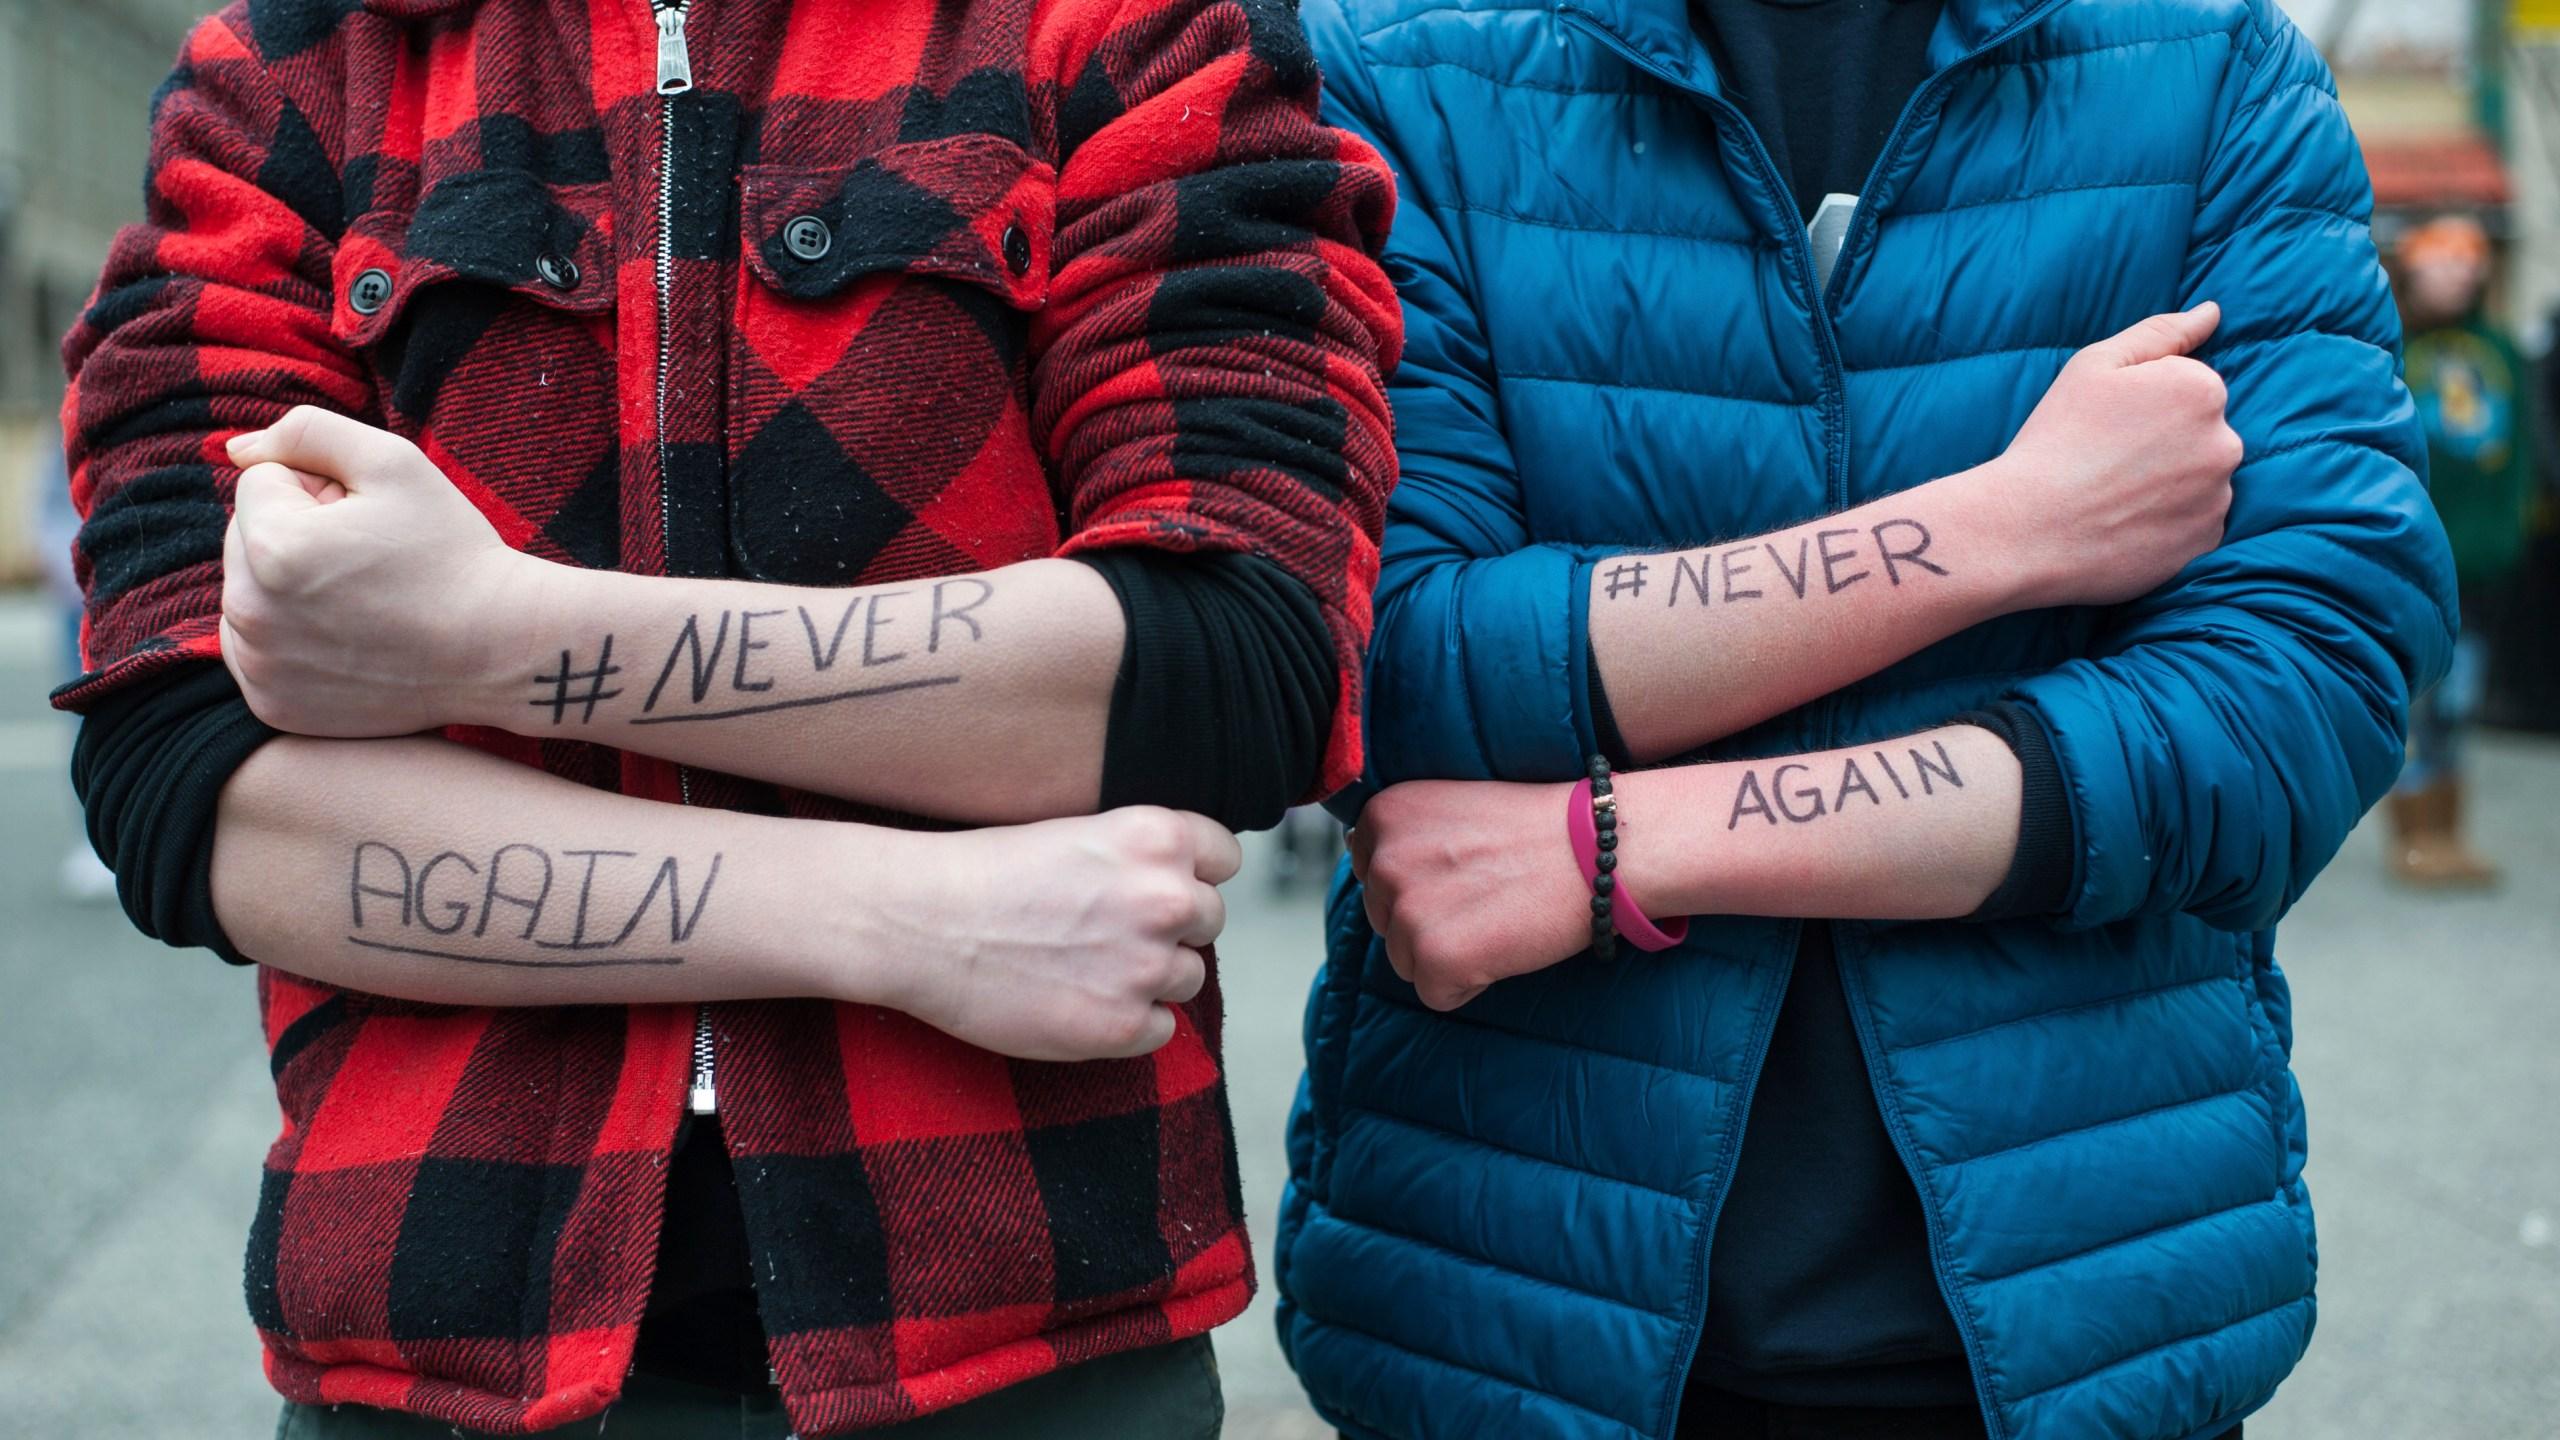 Student_Walkouts_Gun_Violence_Pennsylvania_13235-159532.jpg26273089